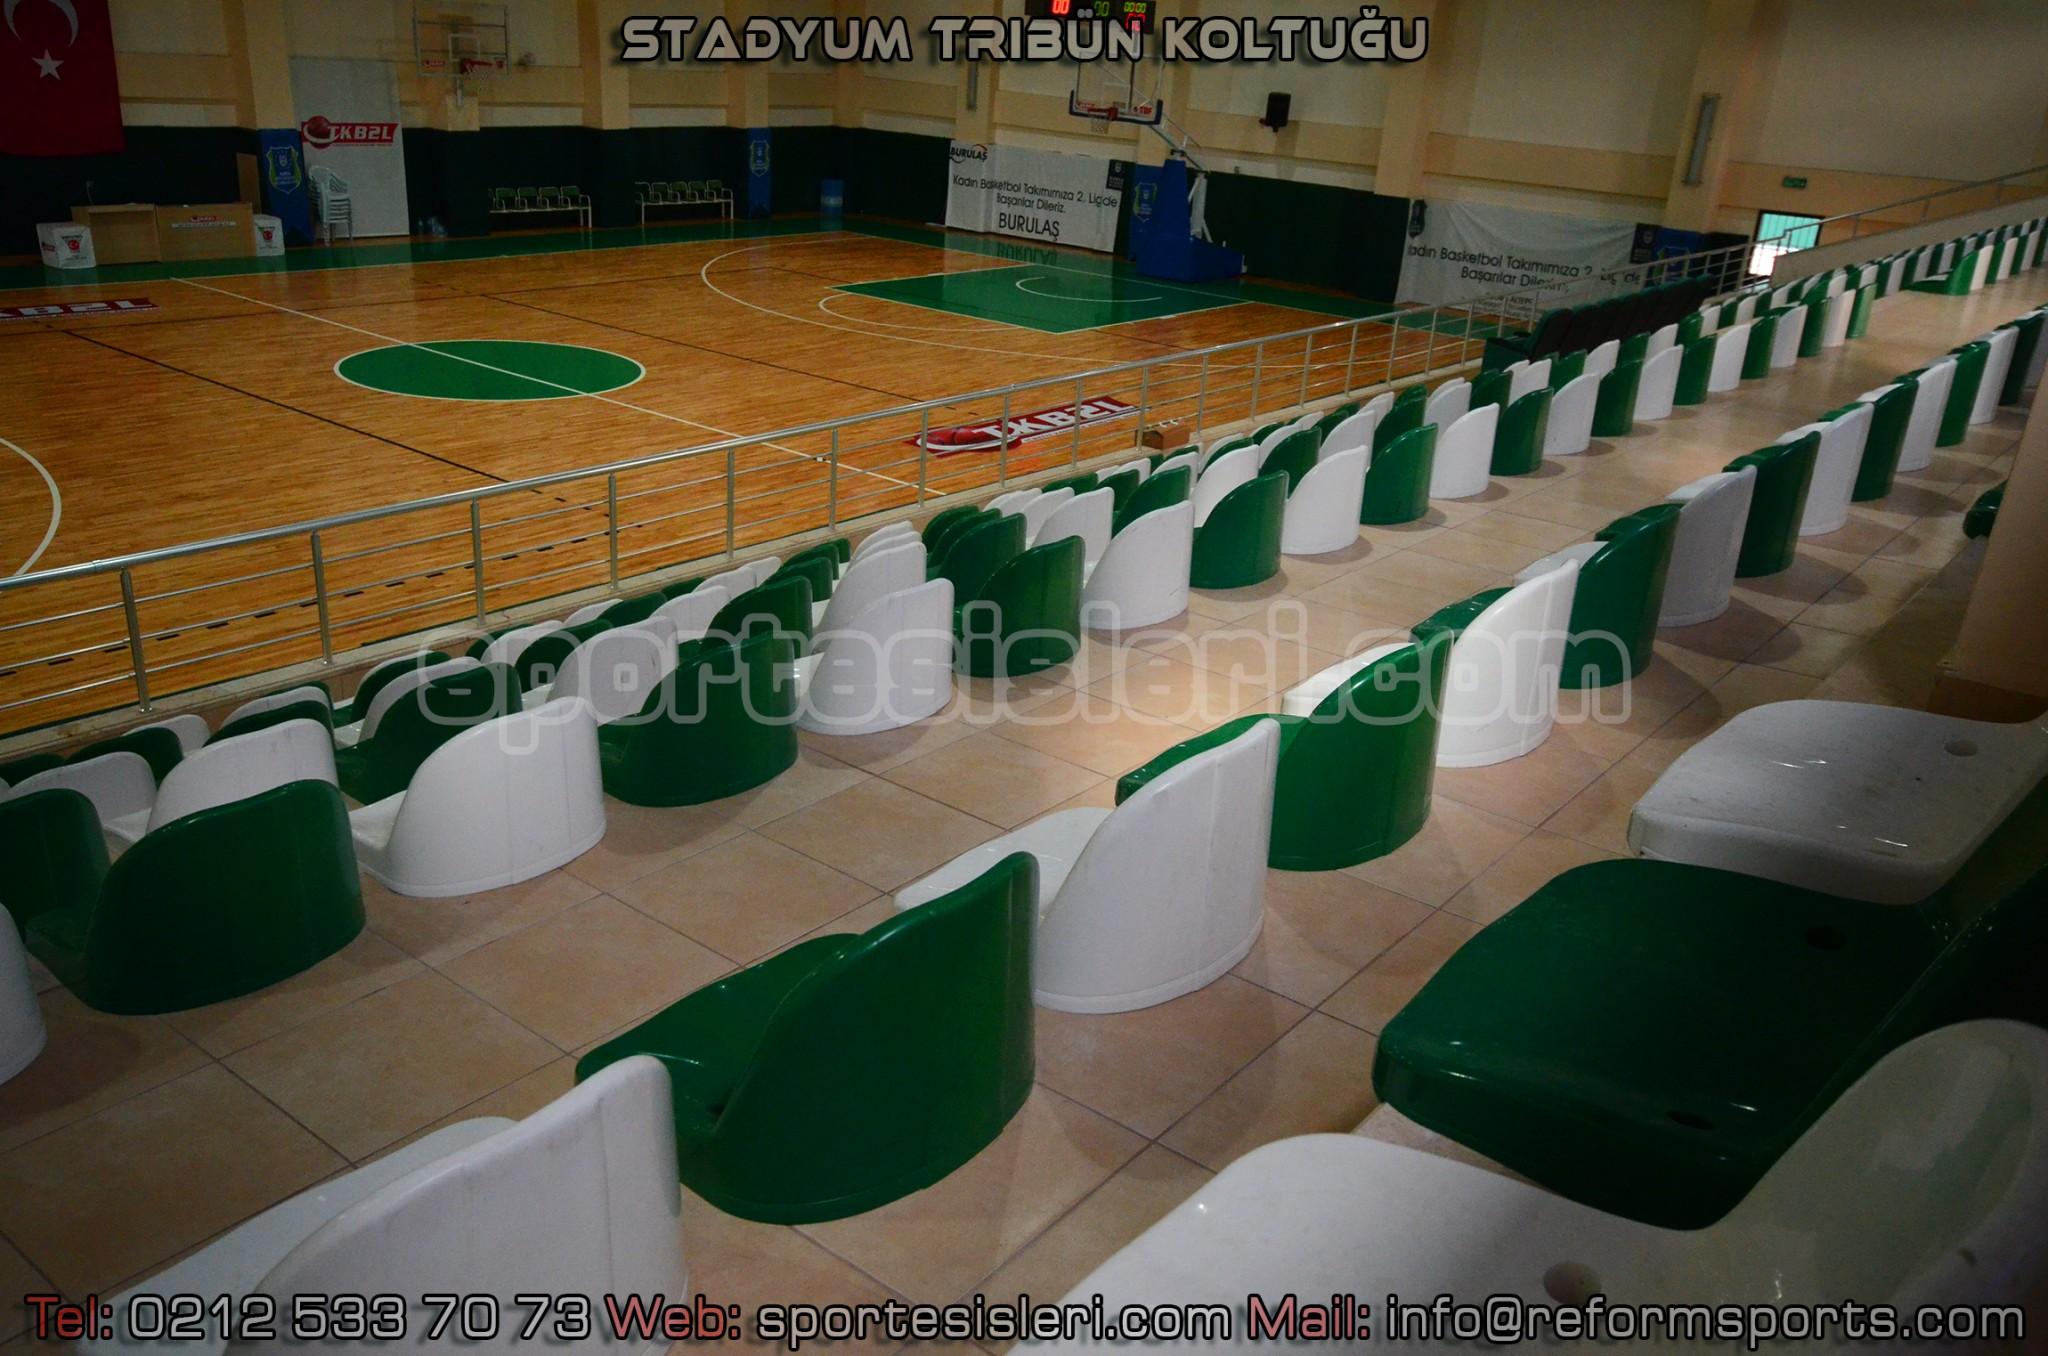 basketbol koltuğu, basketbol sahası koltuğu,